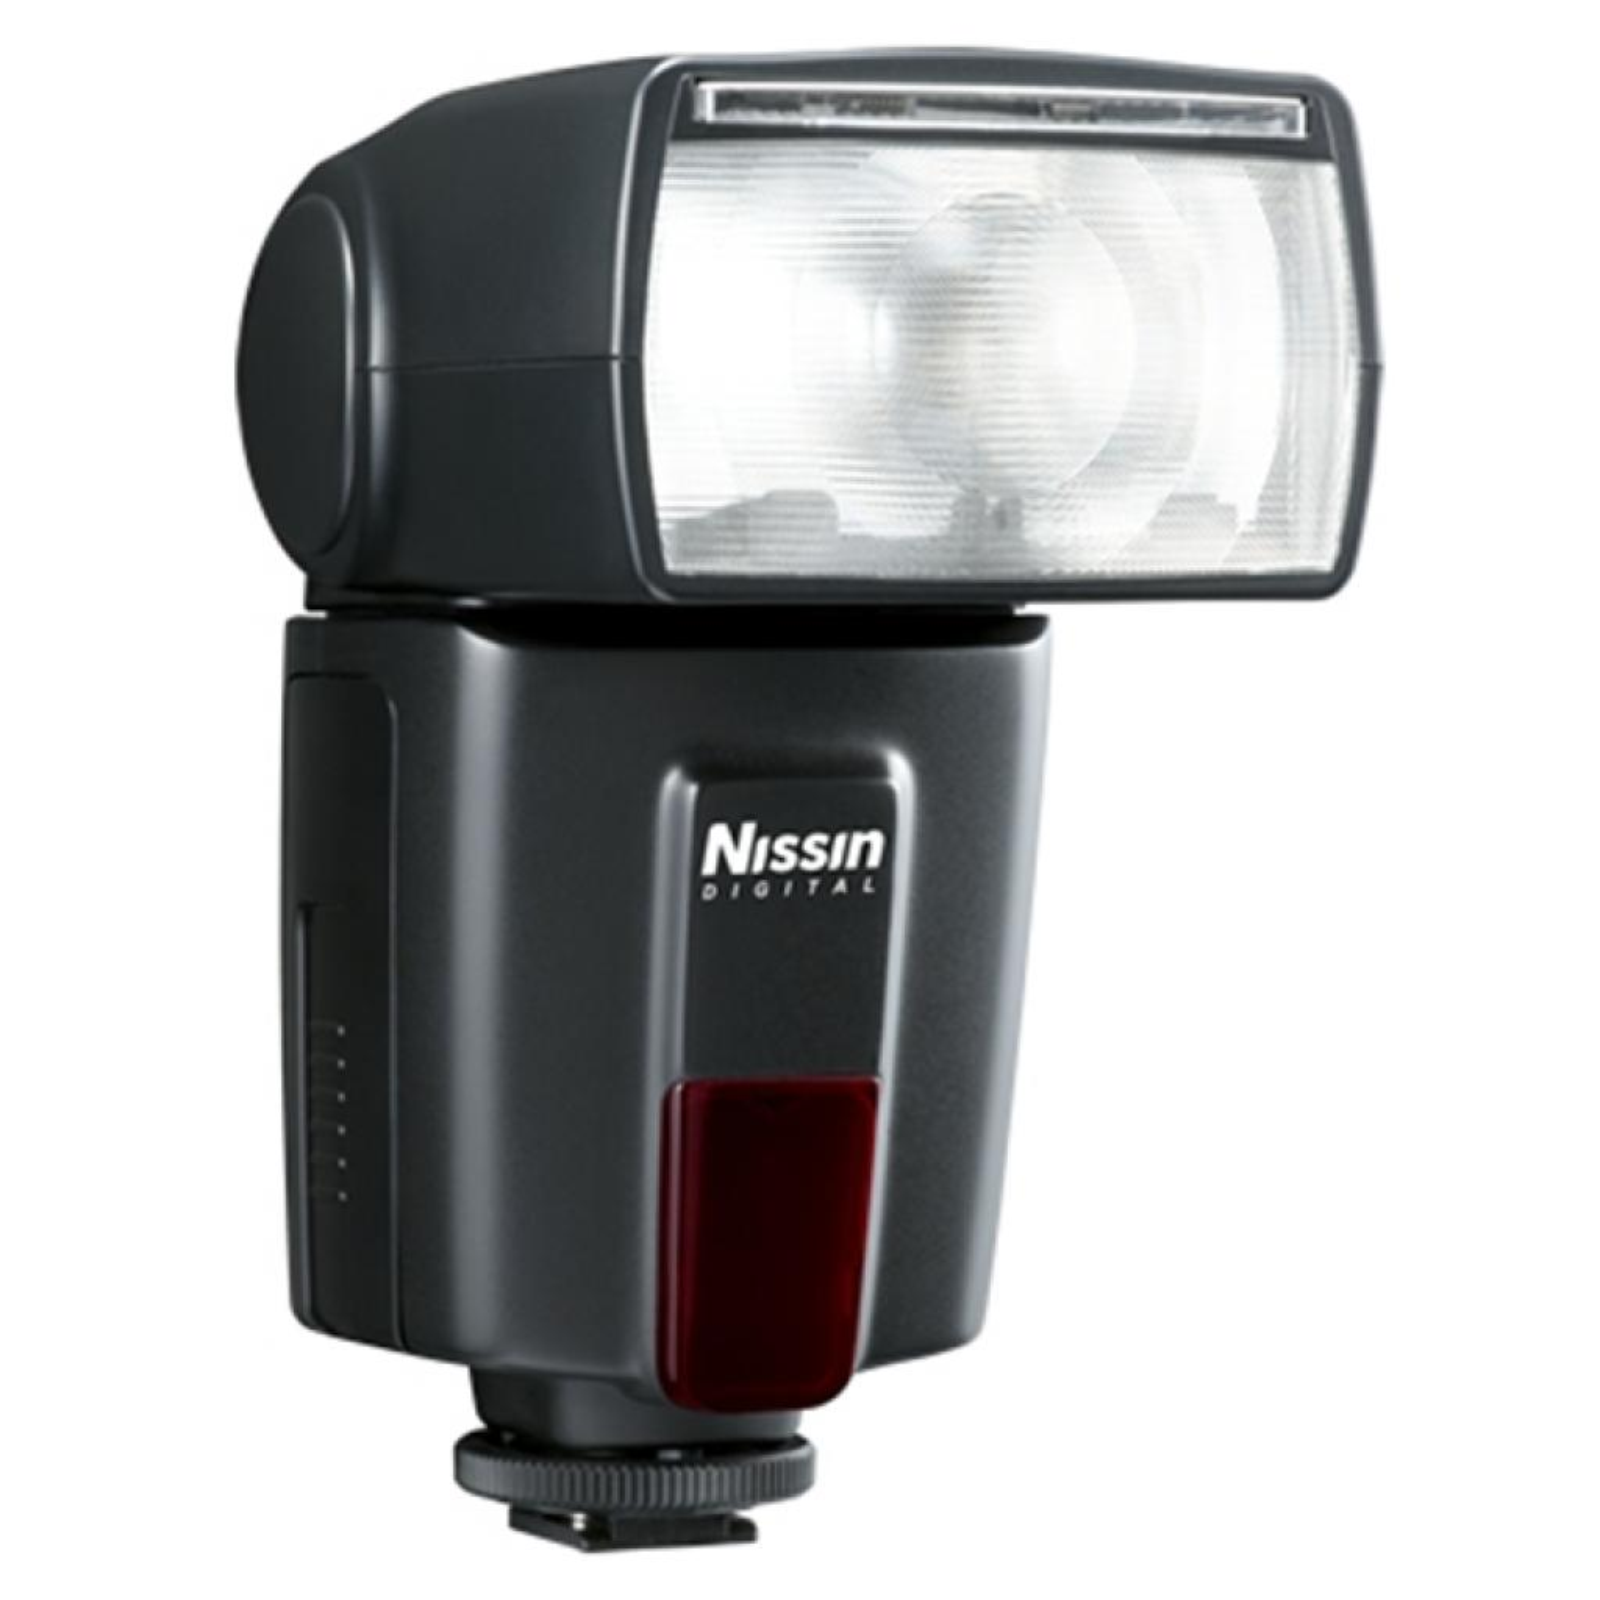 Вспышка Nissin Speedlite Di600 Nikon (N074)